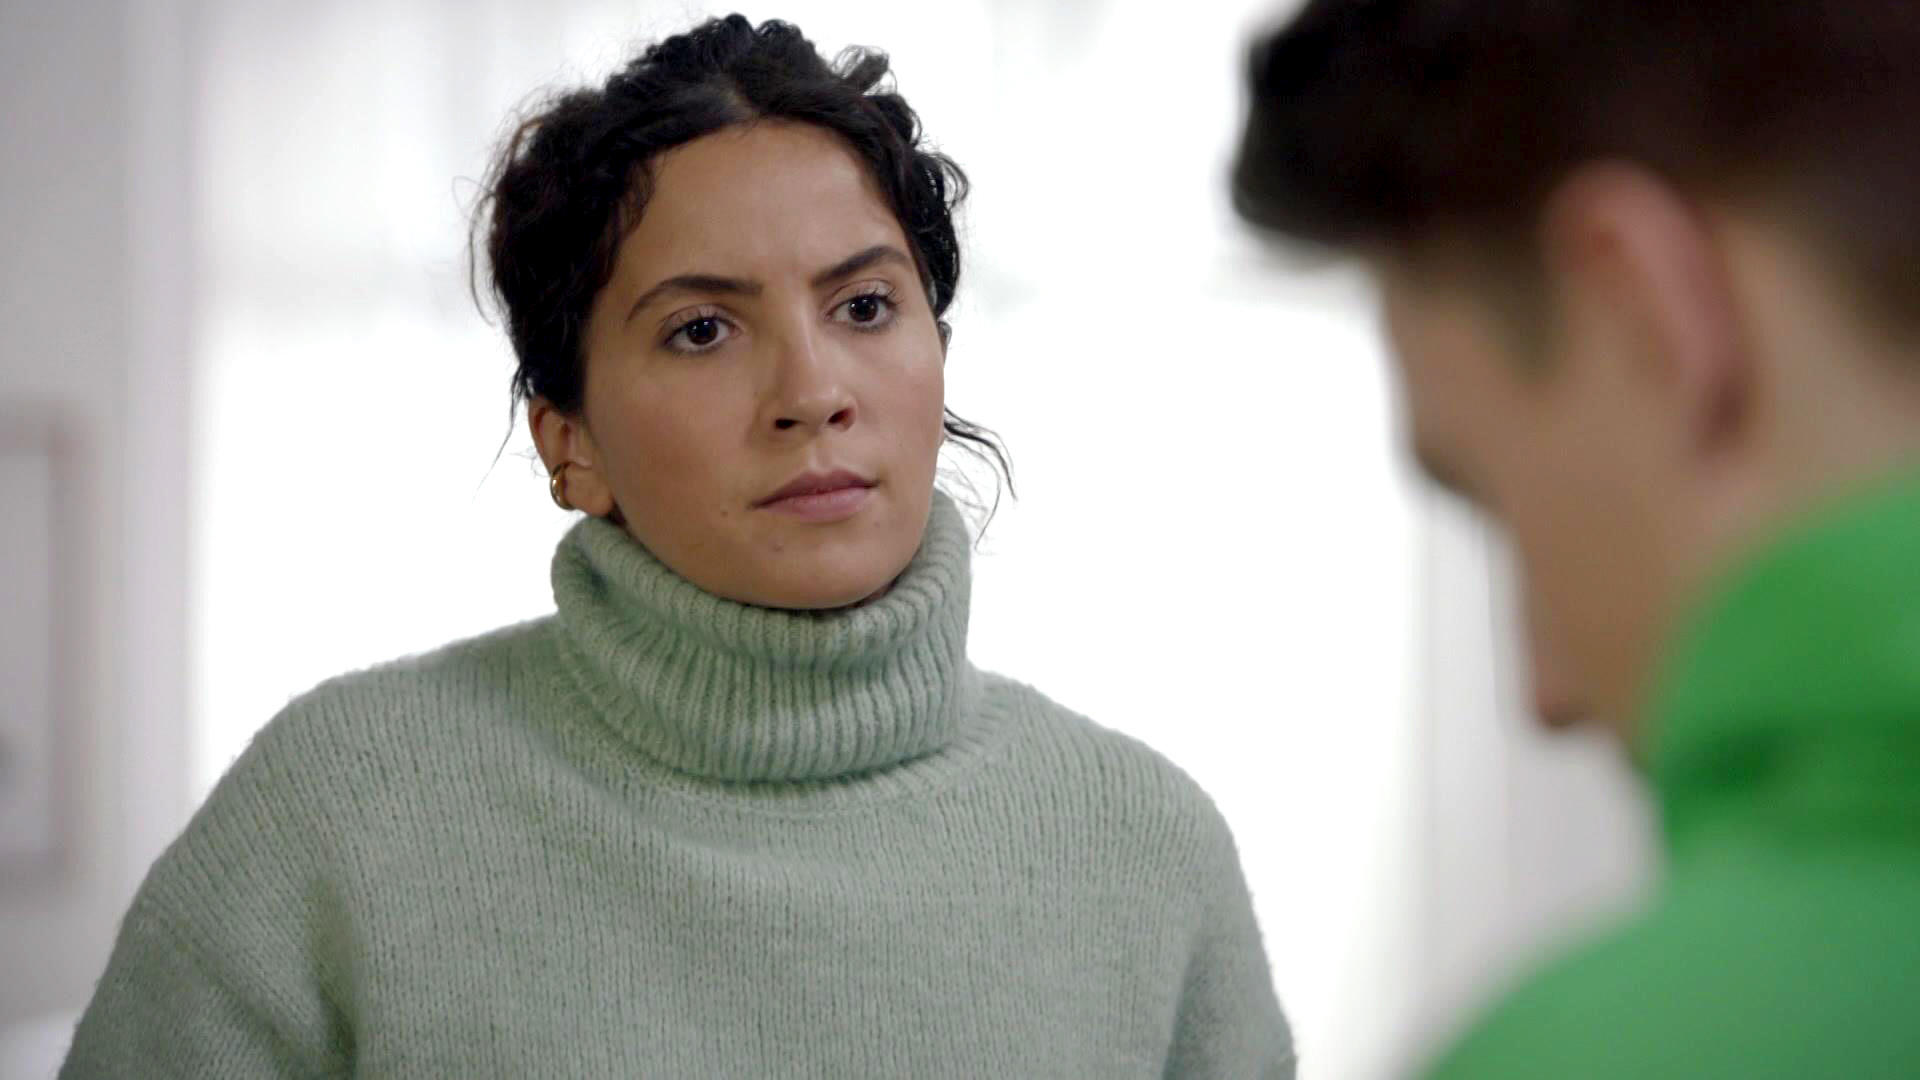 Laura appelliert an Moritz, sie nicht zu verraten | Folge 7229